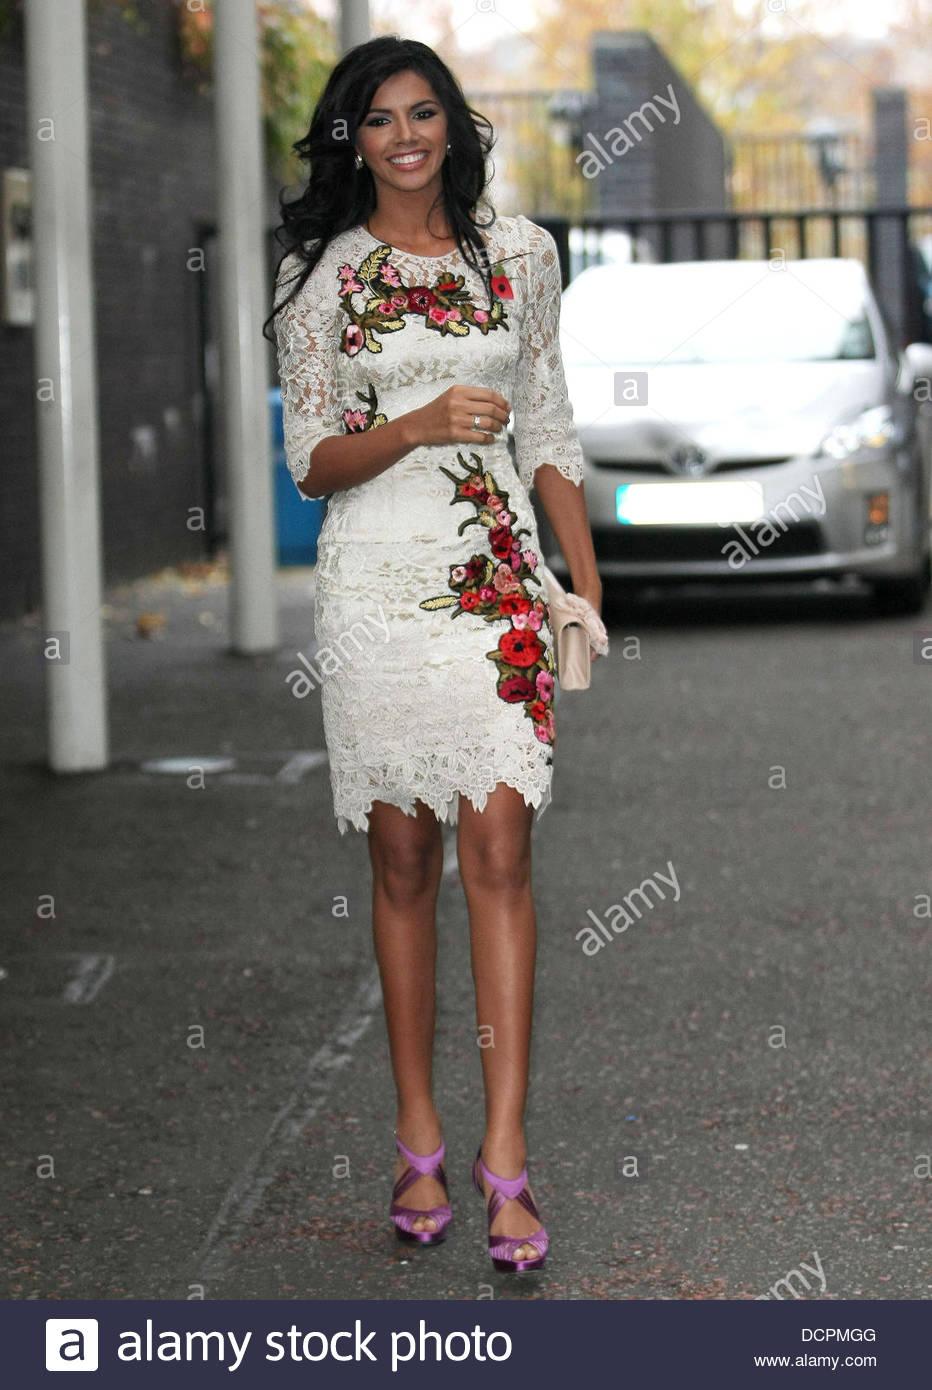 ivian sarcos, miss world 2011.  - Página 4 Miss-w15